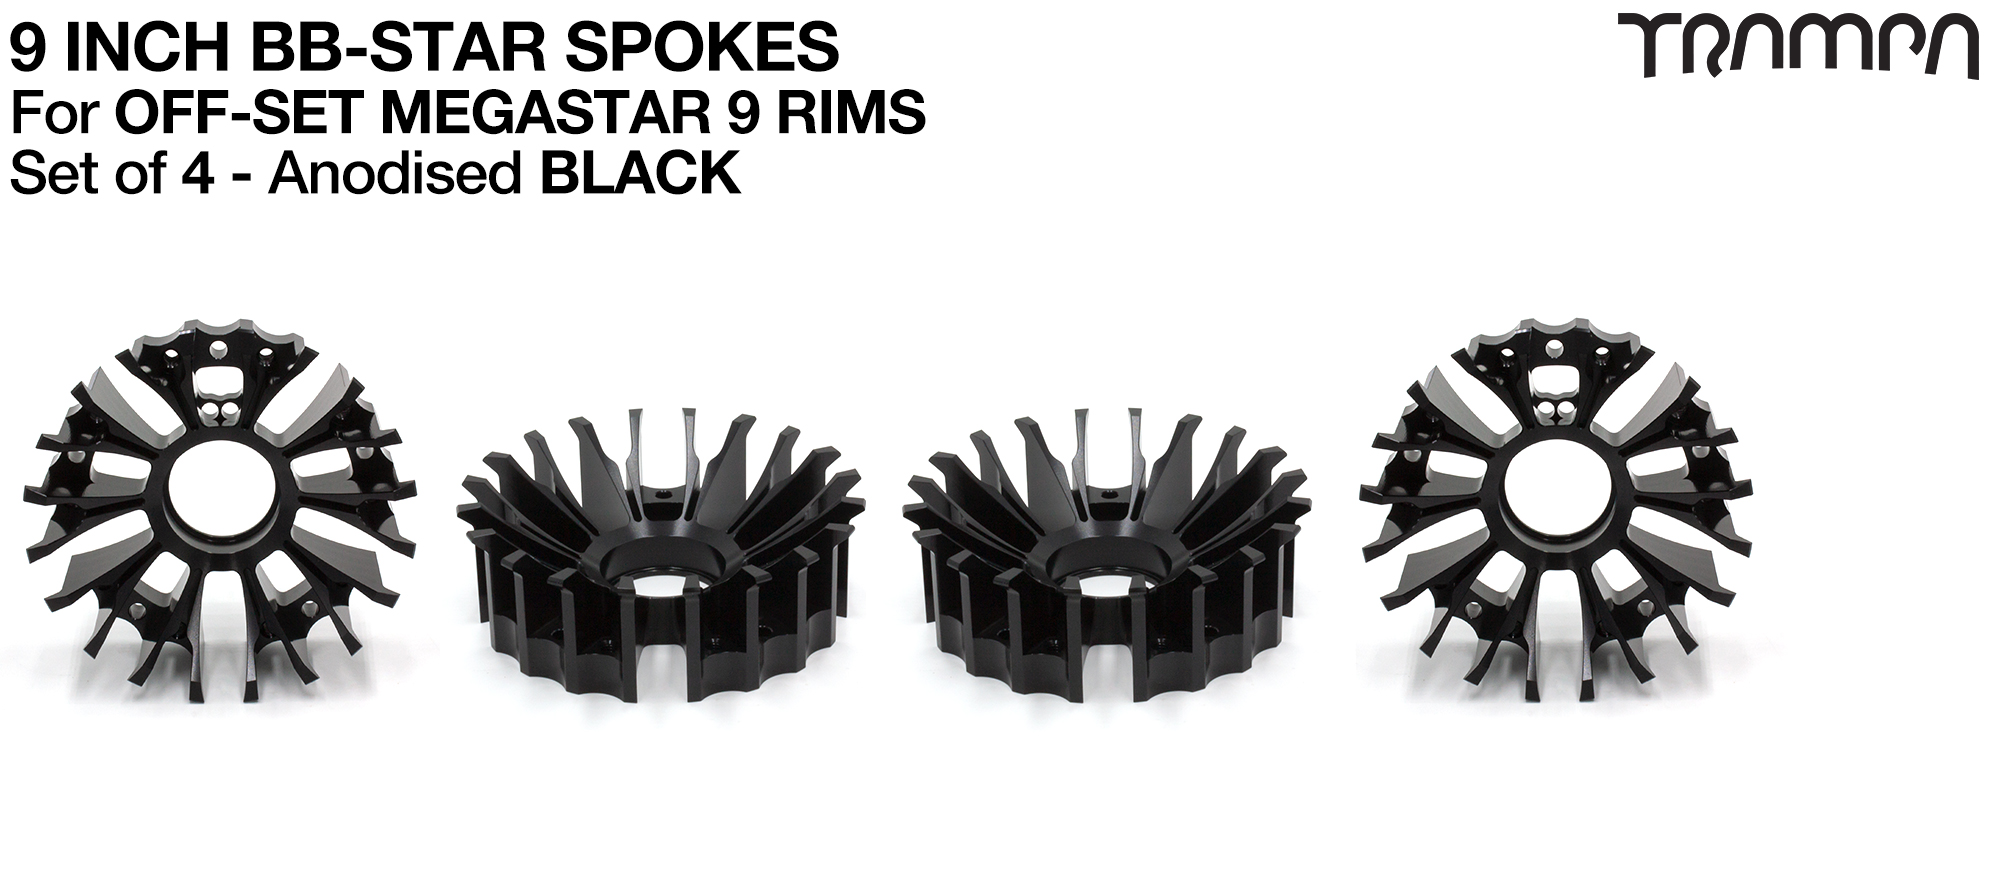 BBStar Spoke for SUPERSTAR or any size MEGASTAR rims - Extruded T6 Aluminium Heat treated & CNC Precision milled - BLACK